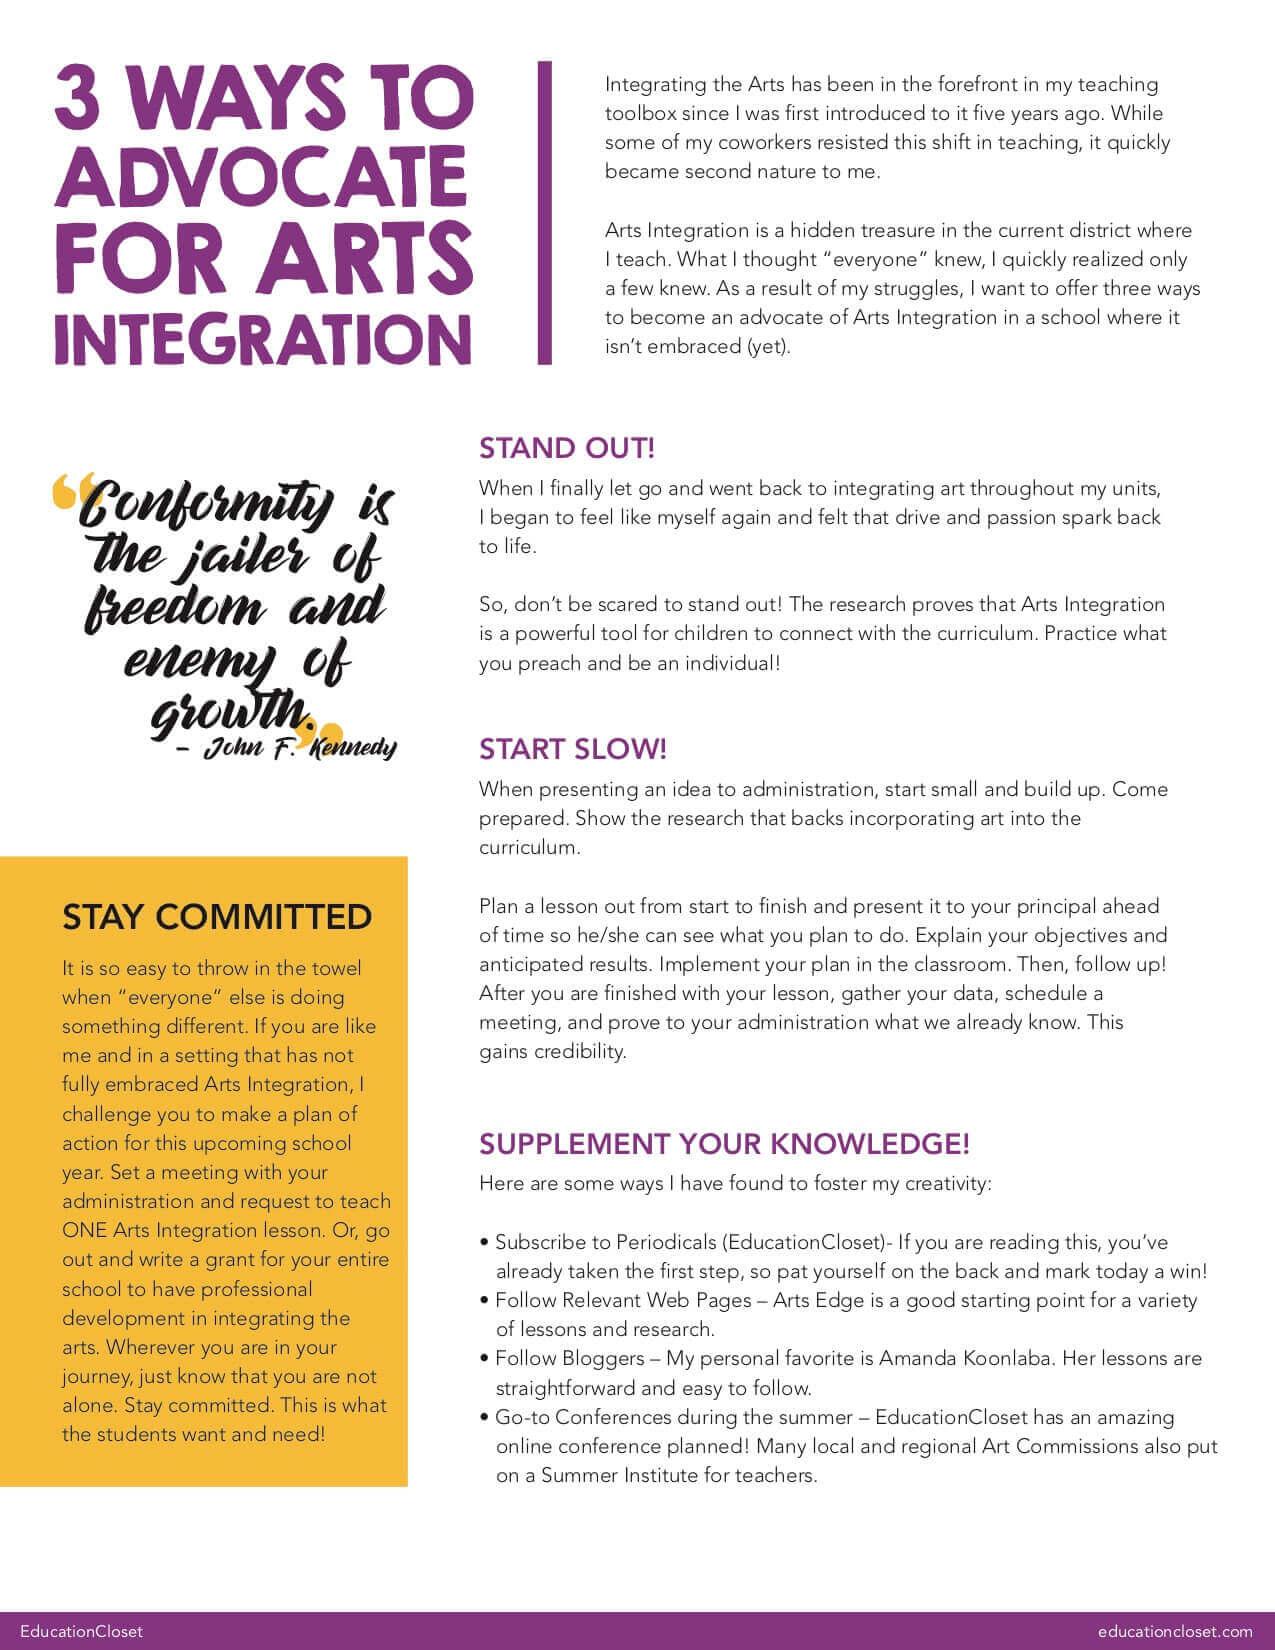 Arts Integration Advocacy Tips